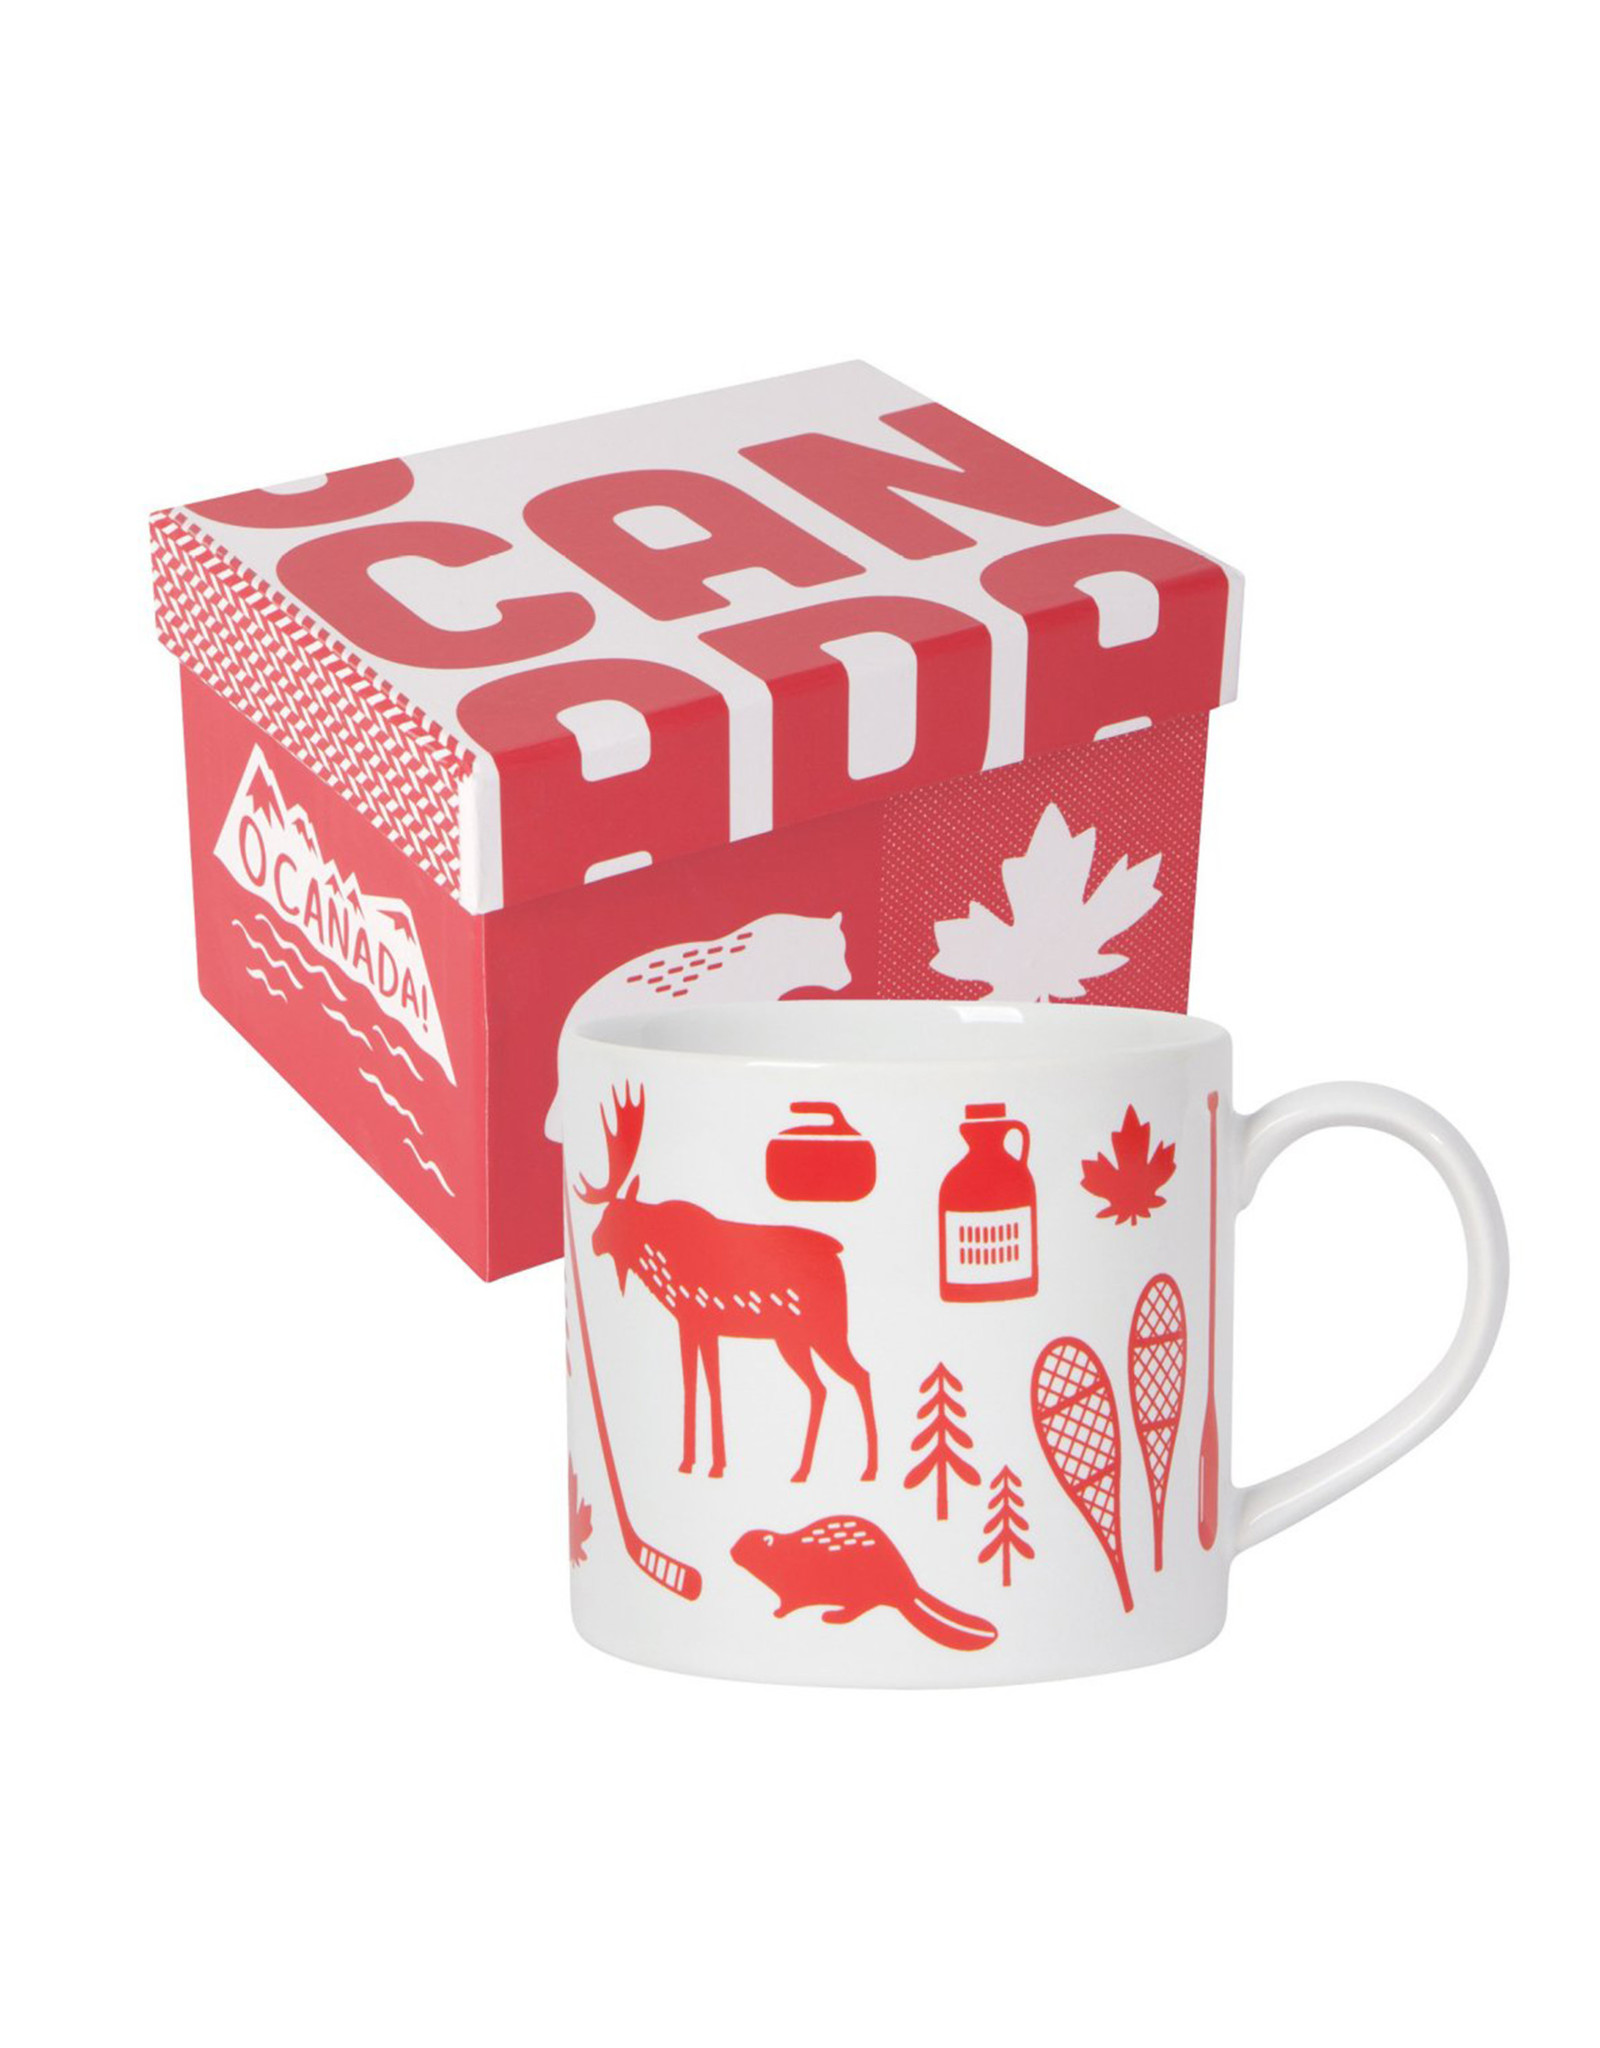 Danica Pattern Mug, O Canada